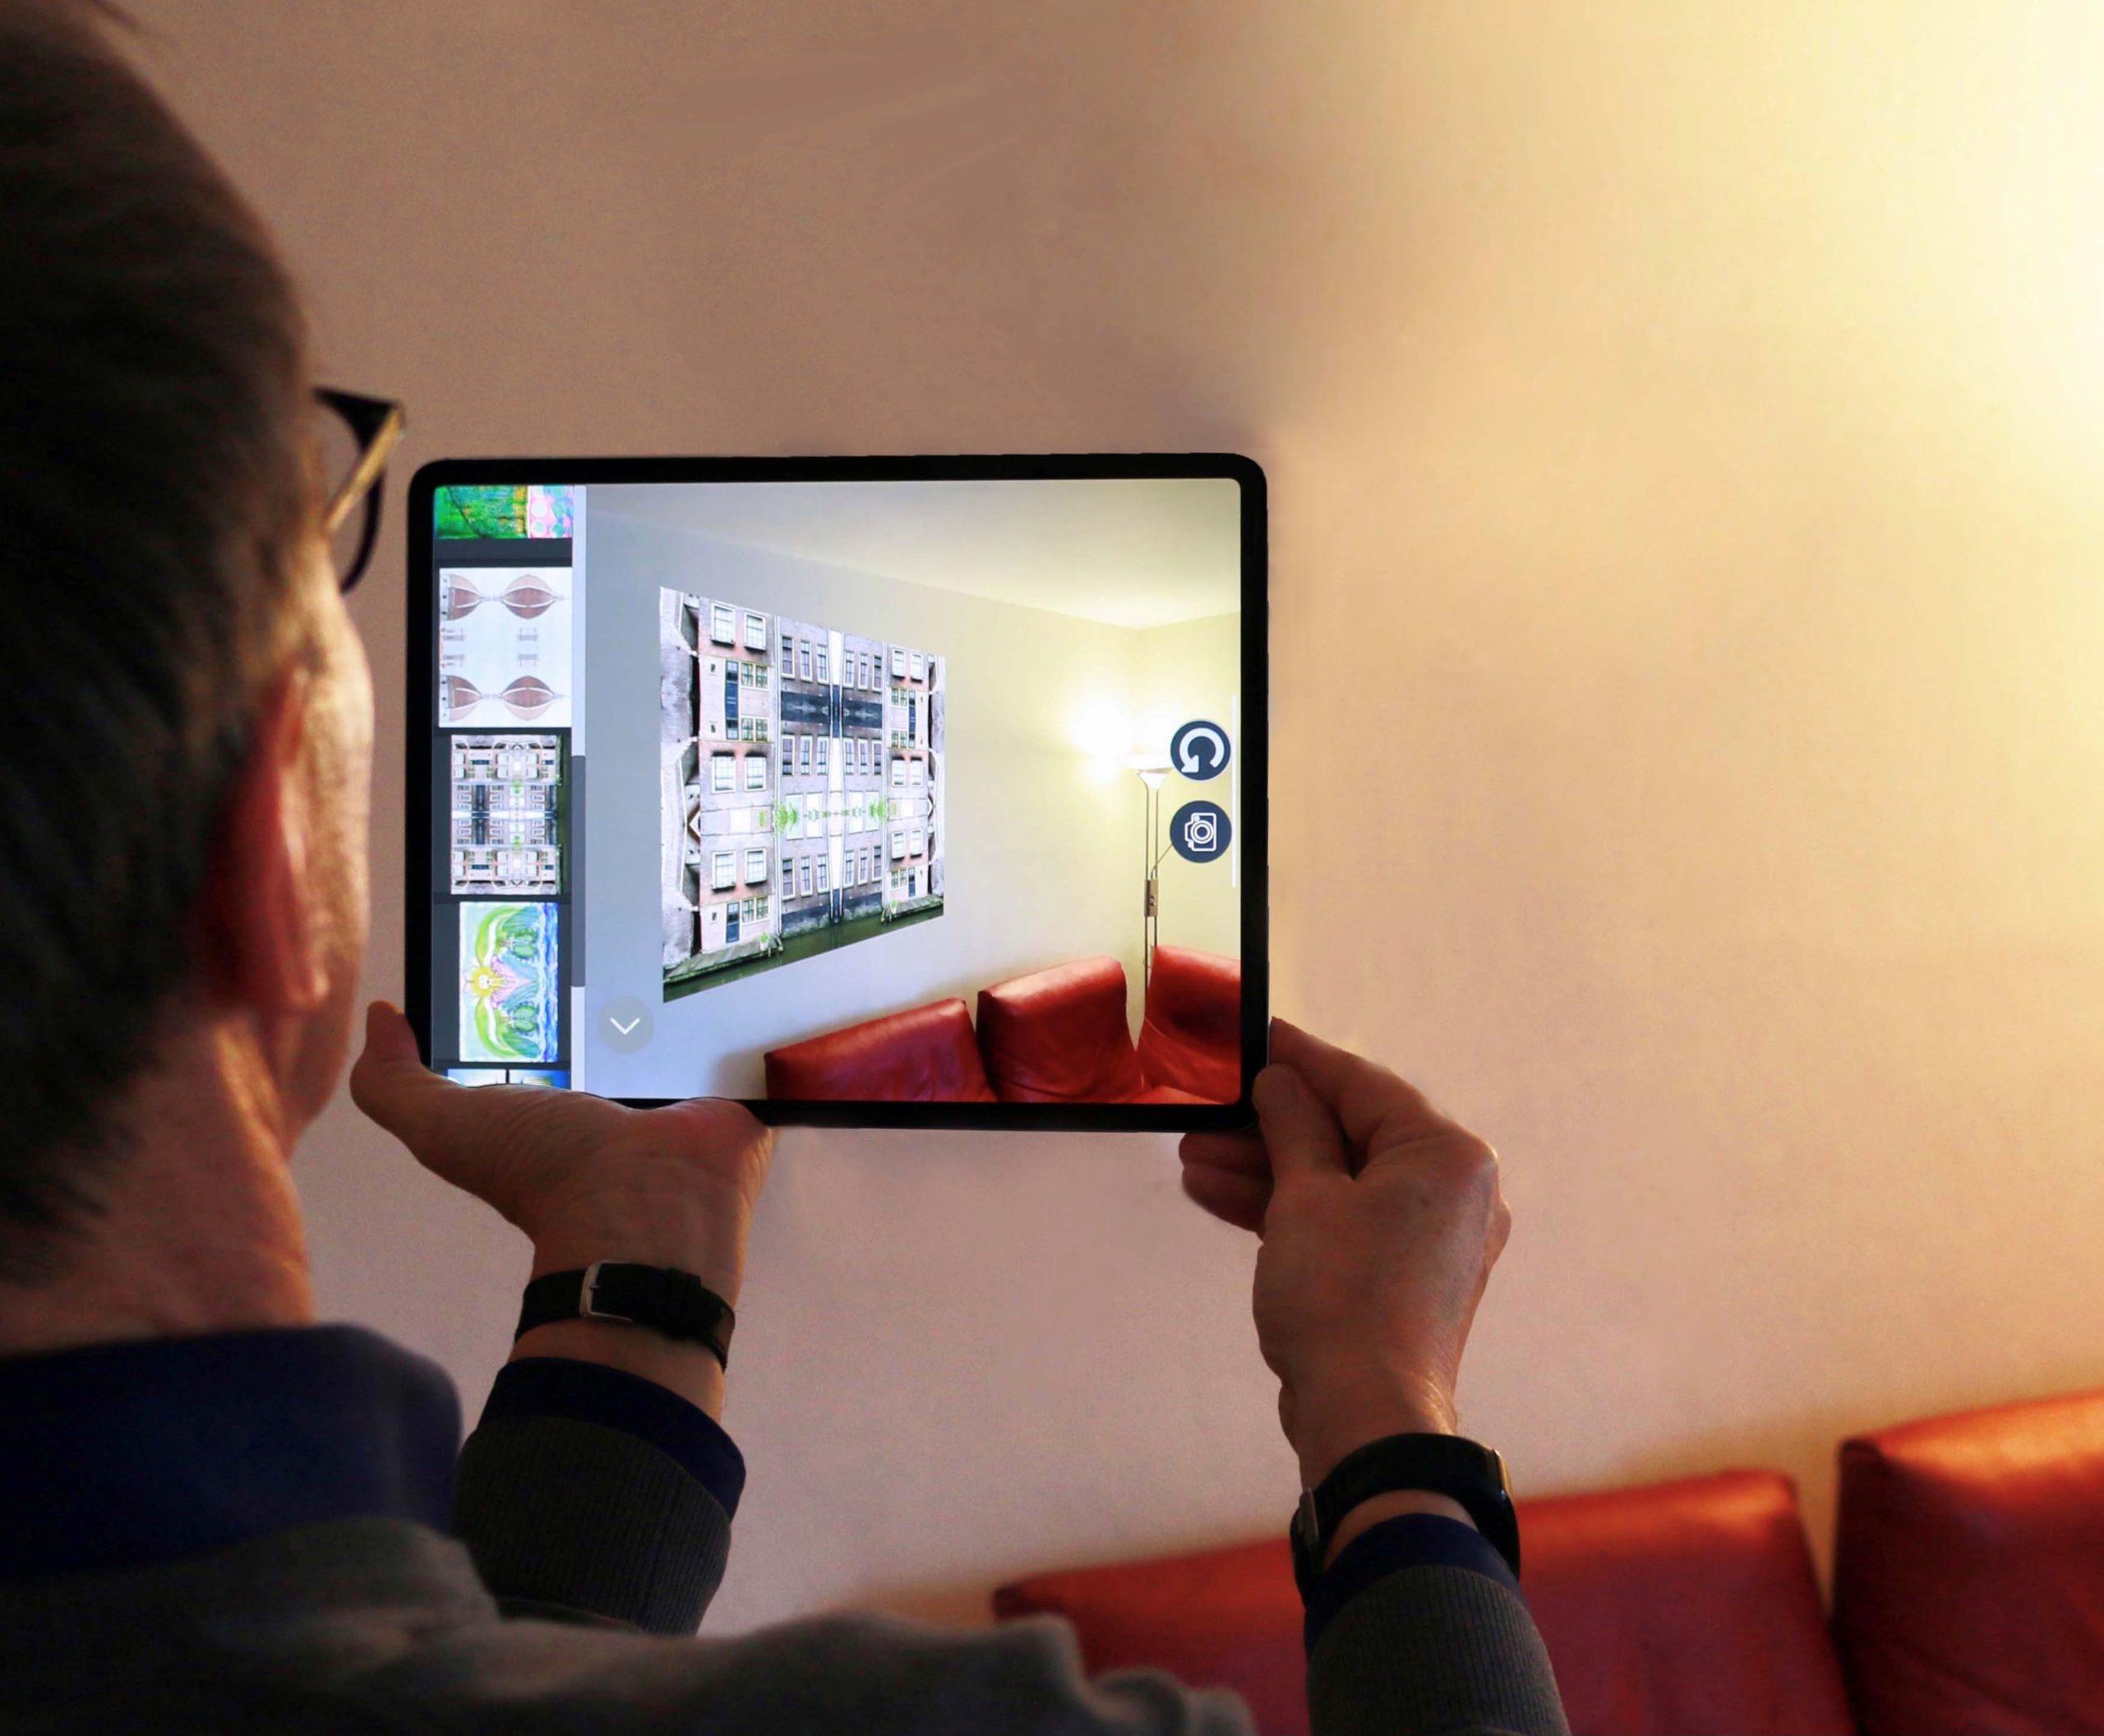 App-Tipp-Per-Augmented-Reality-Kunstwerke-zuhause-ausprobieren-